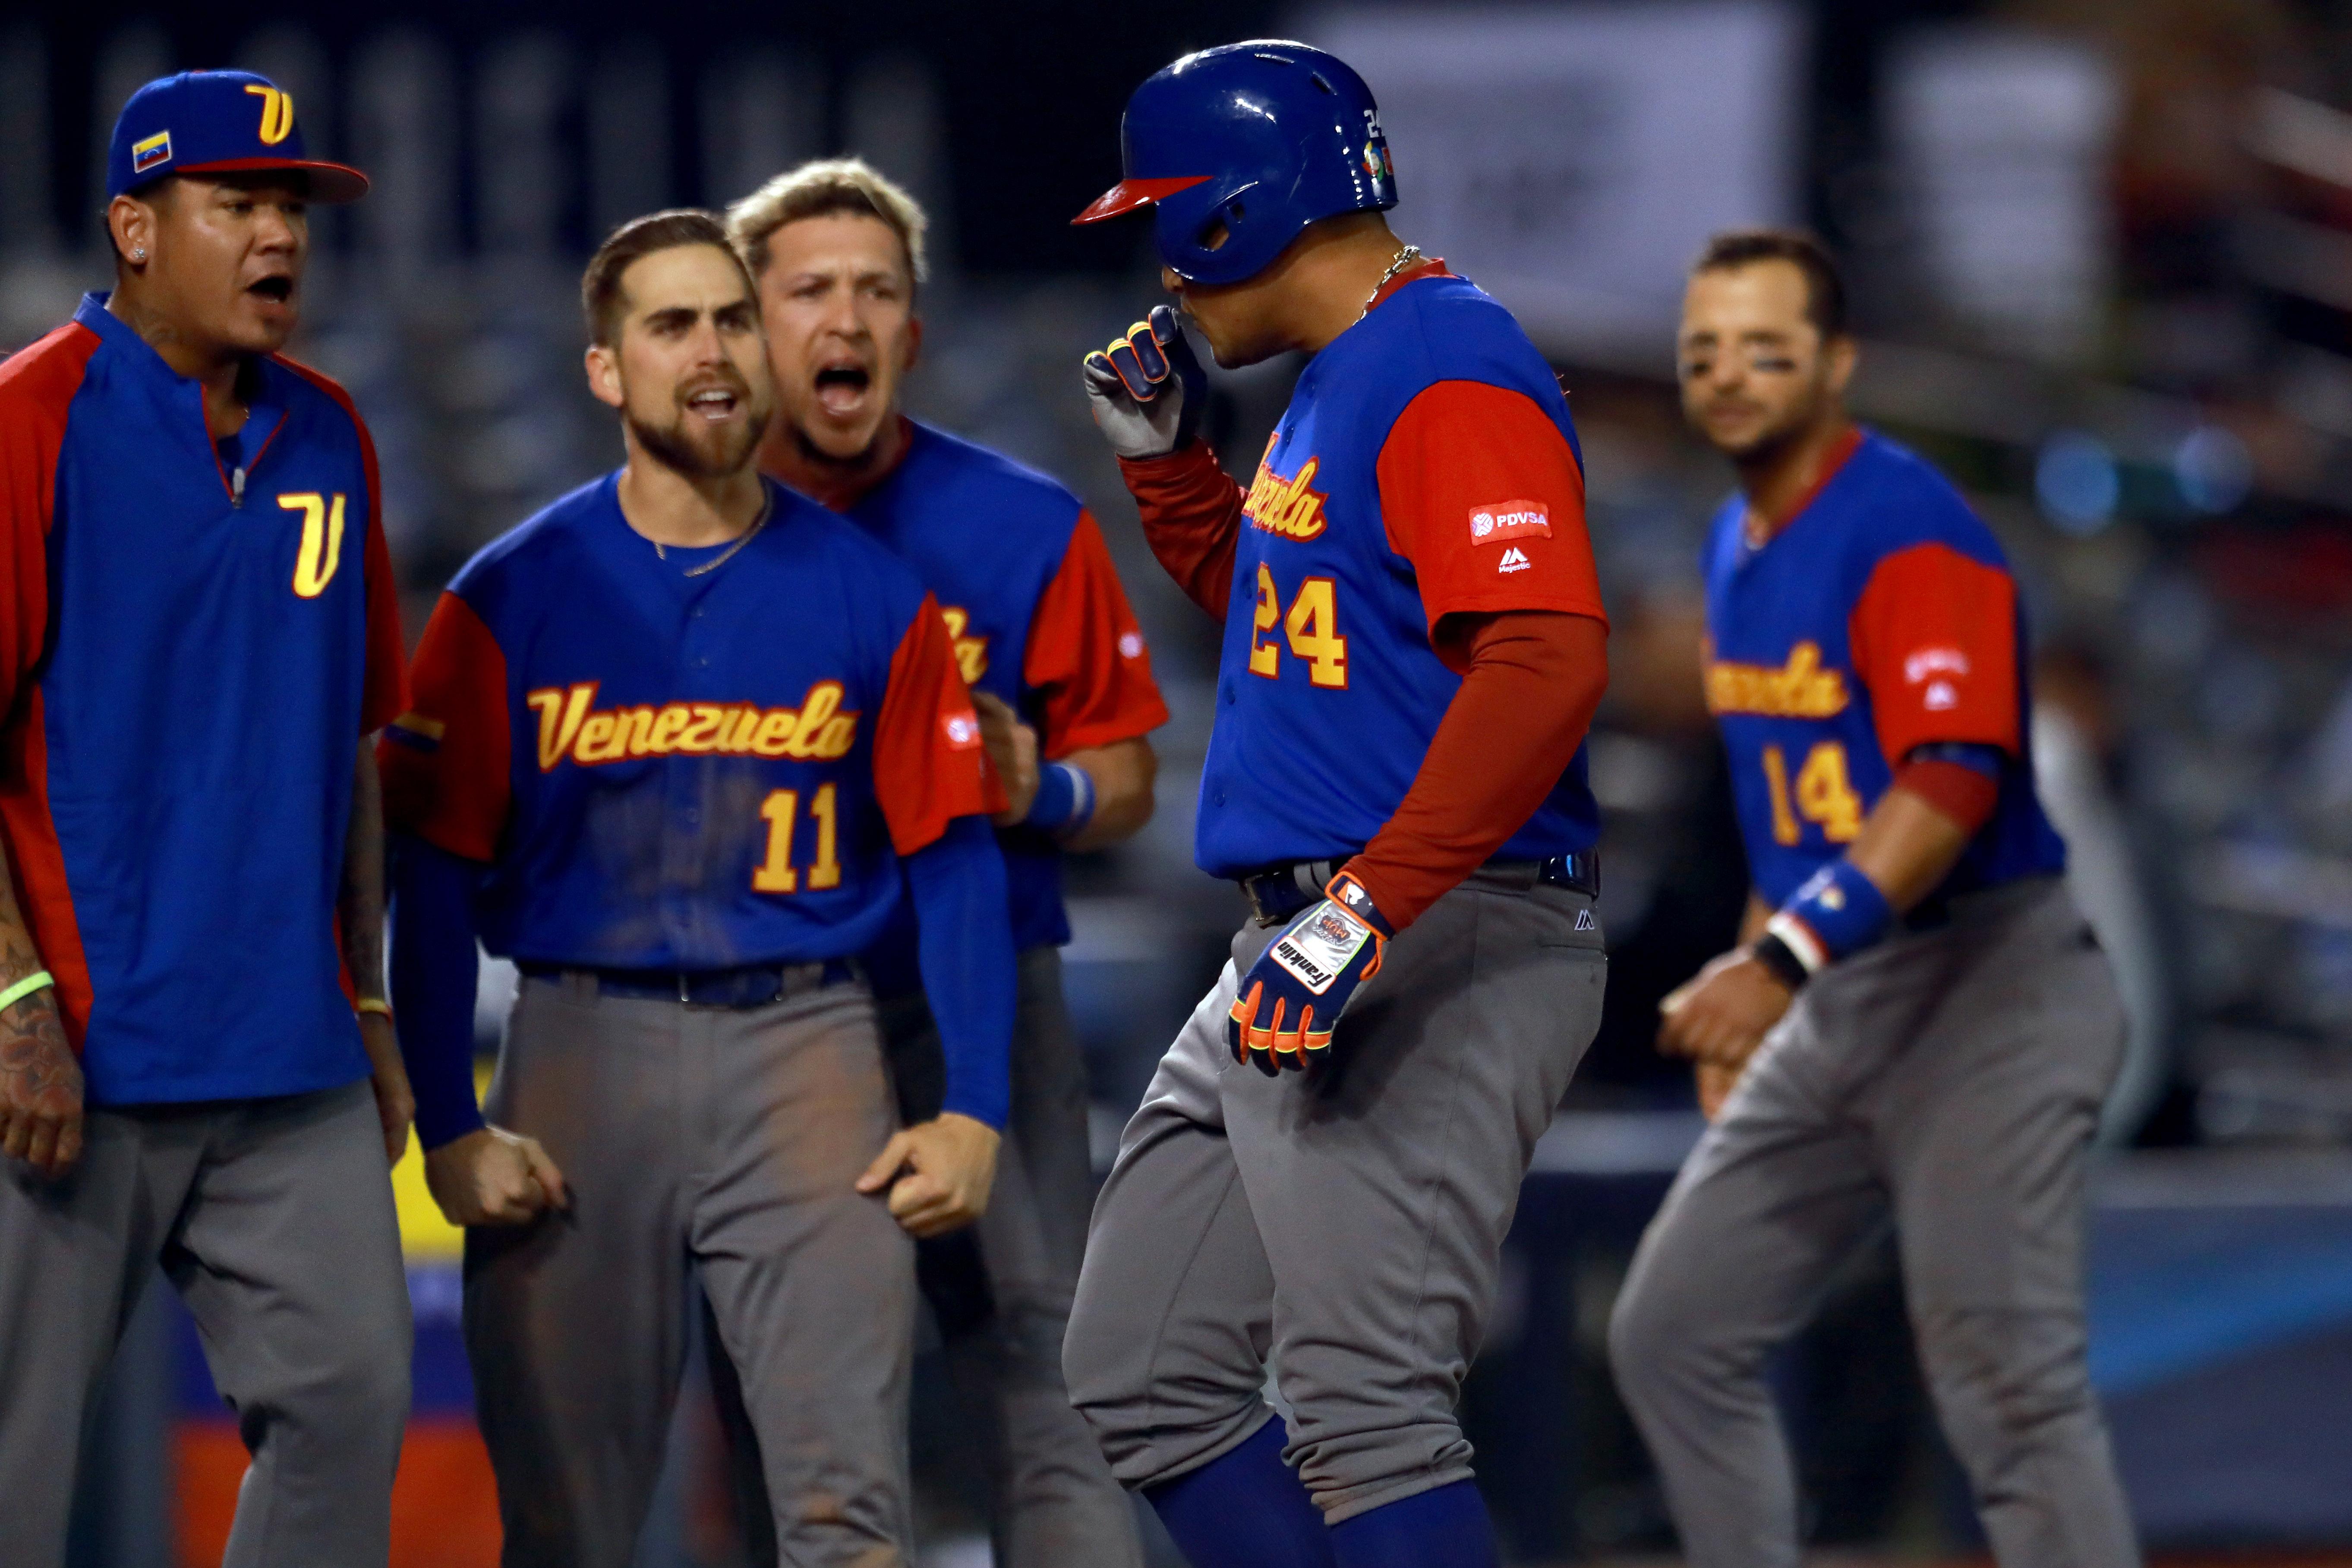 World Baseball Classic - Pool D - Game 7 - Venezuela v Italy